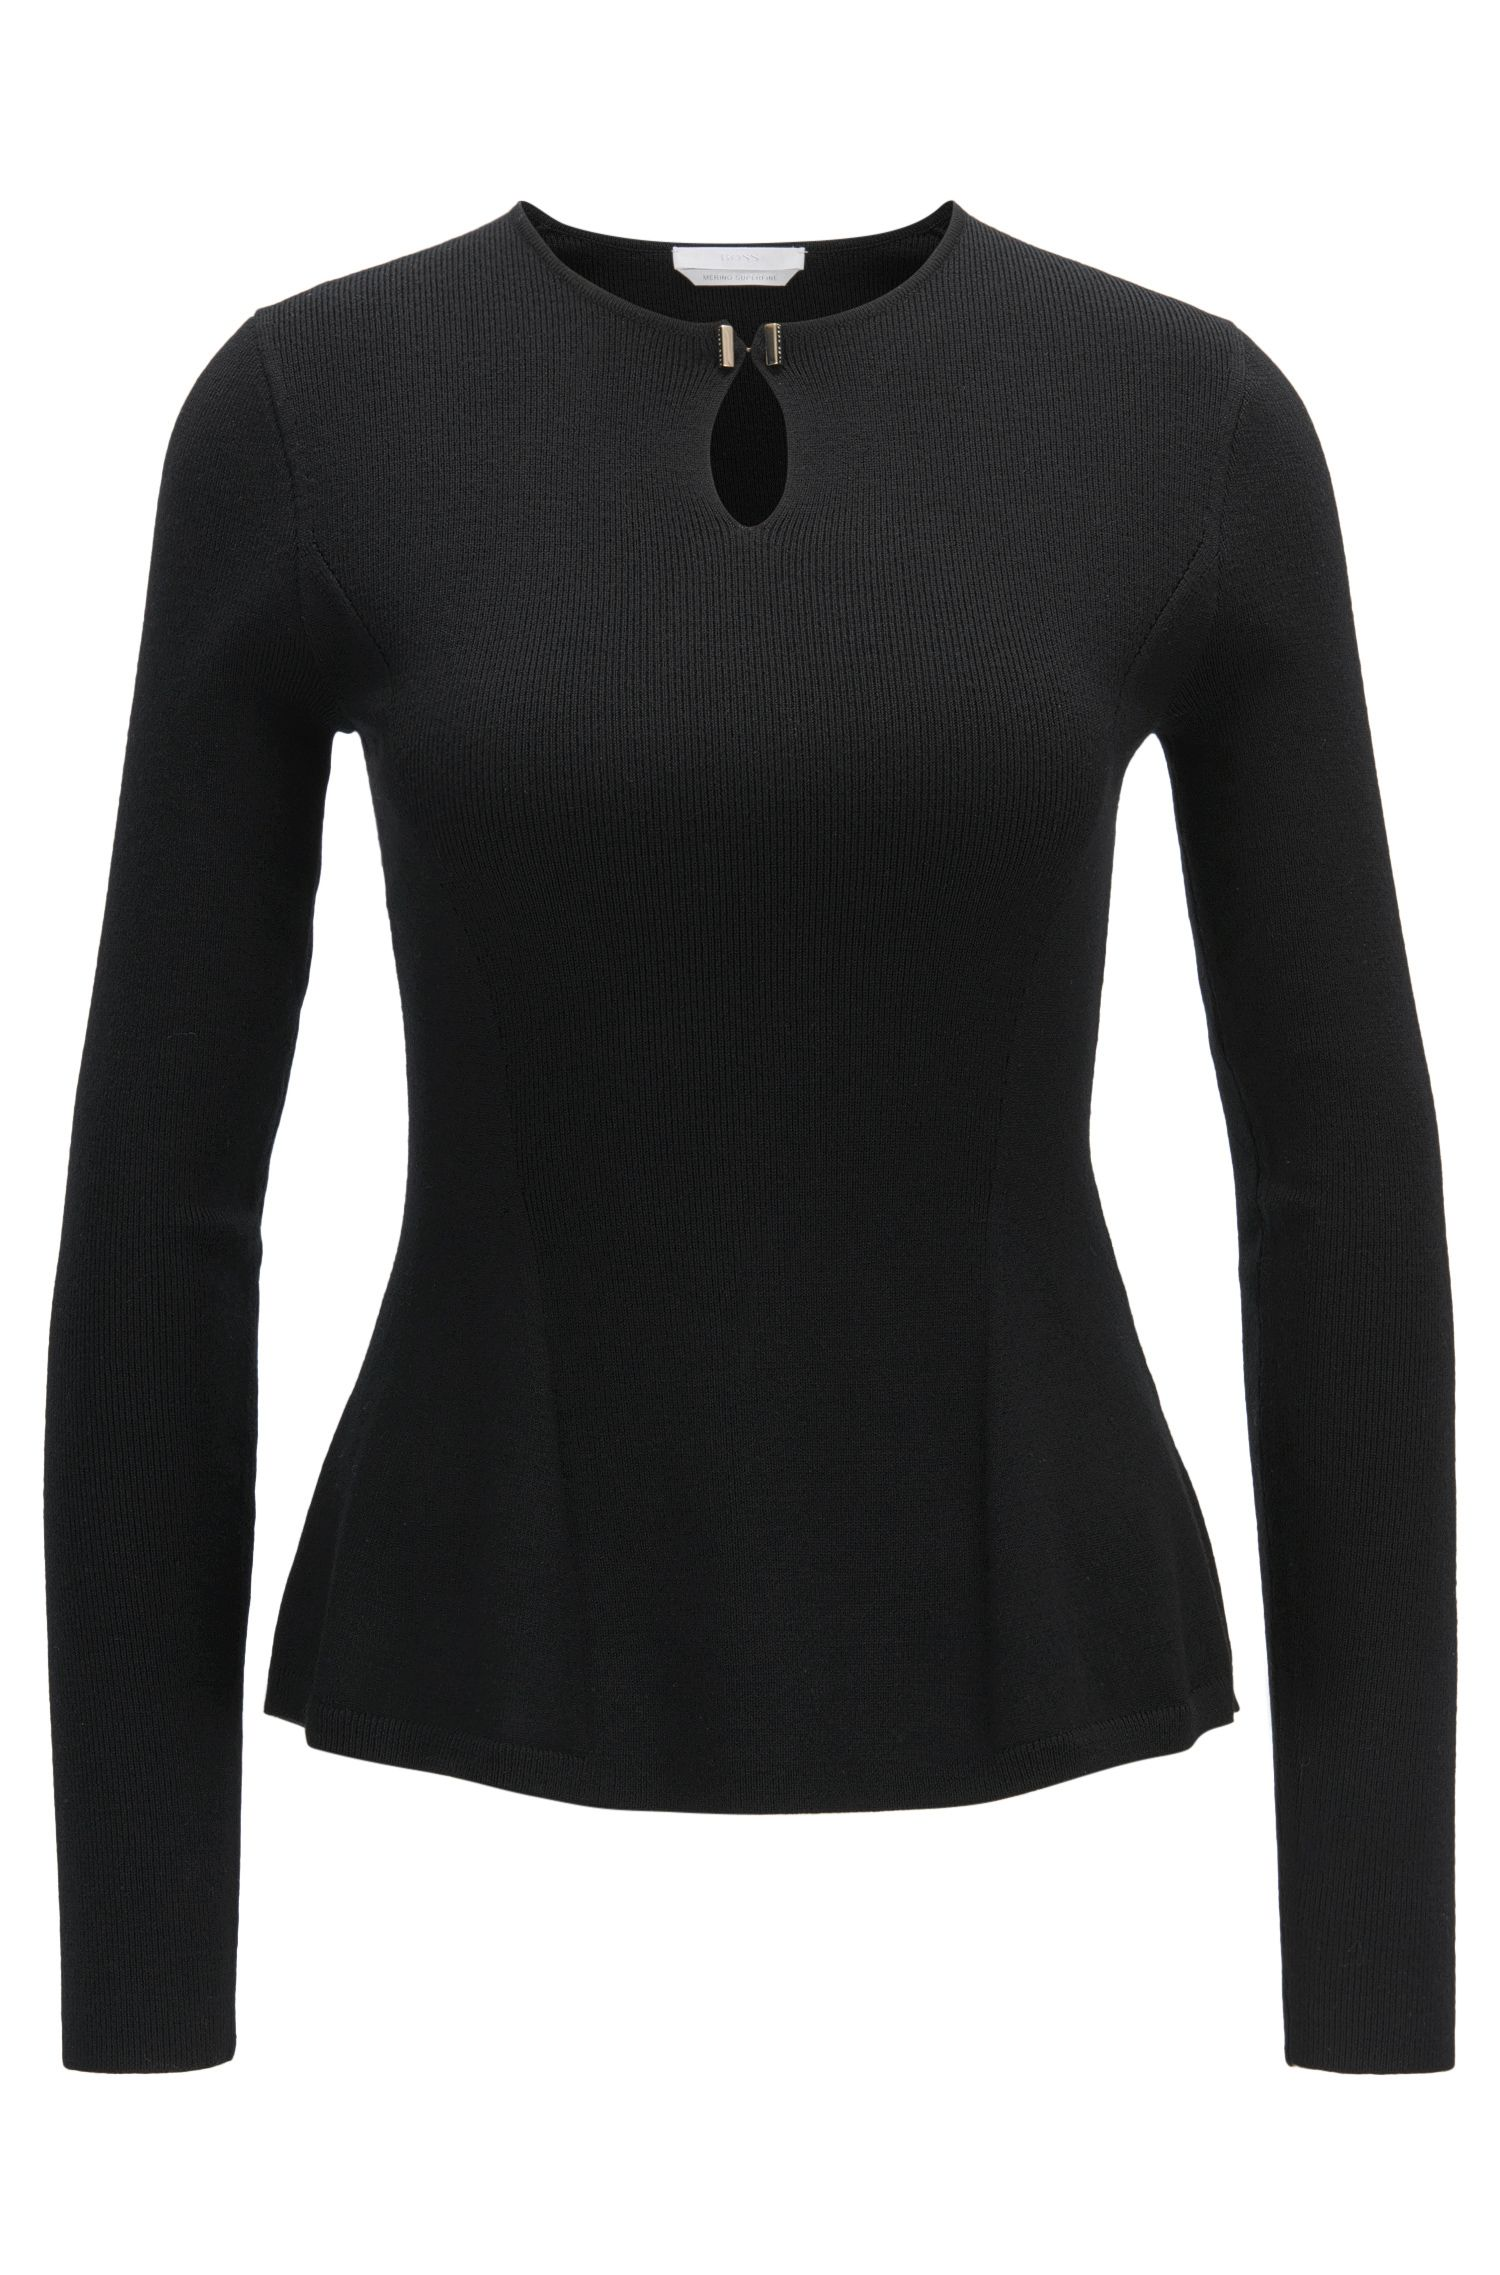 Mercerized Virgin Wool Peplum Sweater | Filga